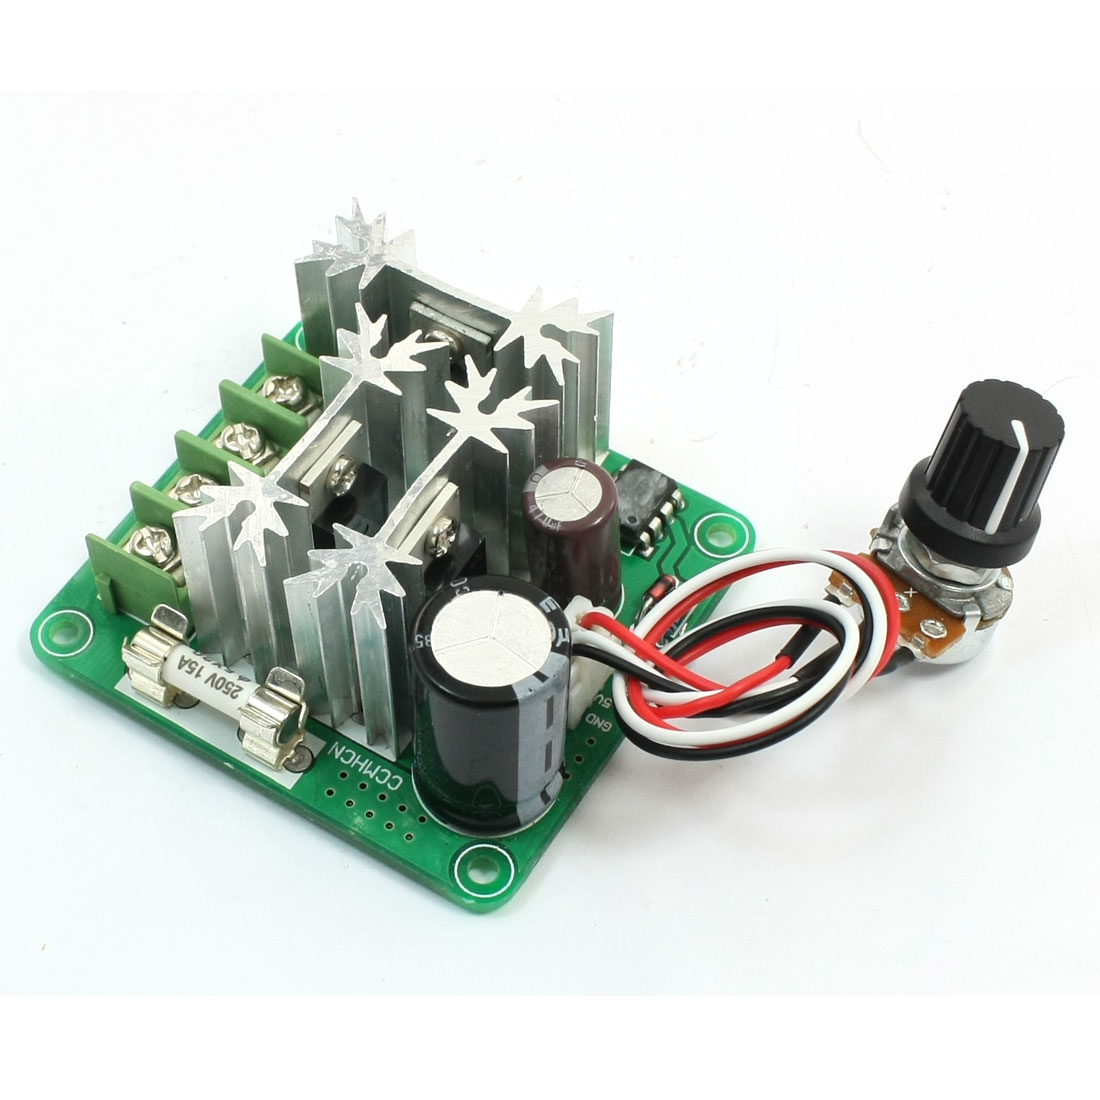 CCMHCN 6V-90V 15A 1000W PWM DC Motor Speed Regulation Controller